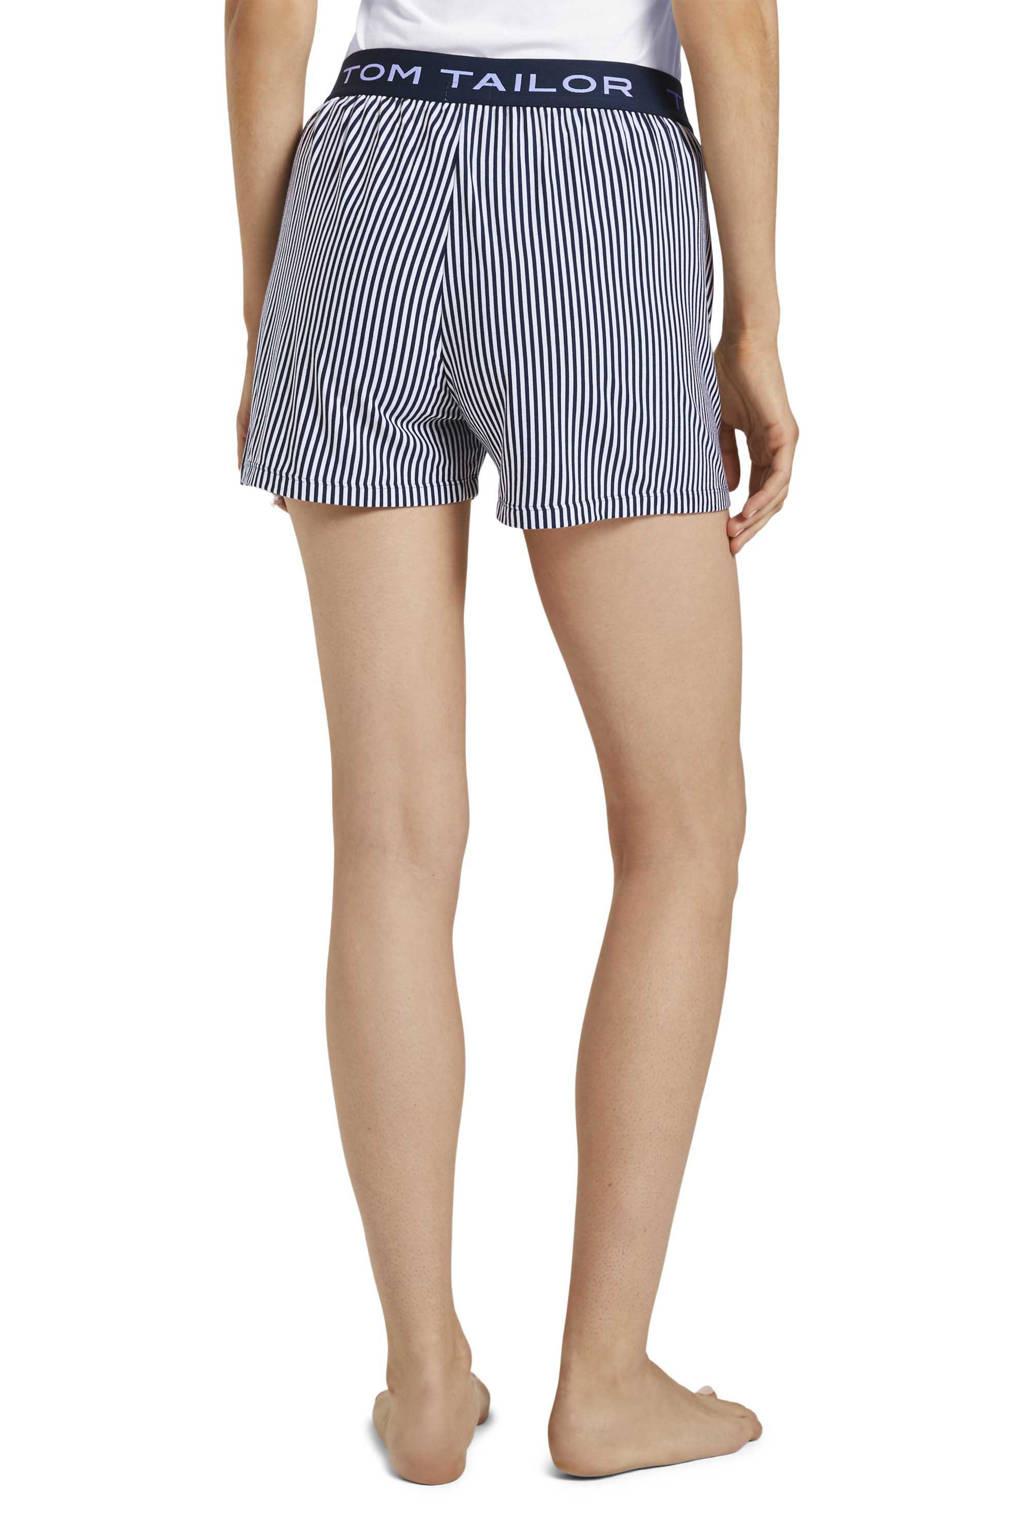 Tom Tailor gestreepte pyjamashort donkerblauw/wit, Donkerblauw/wit